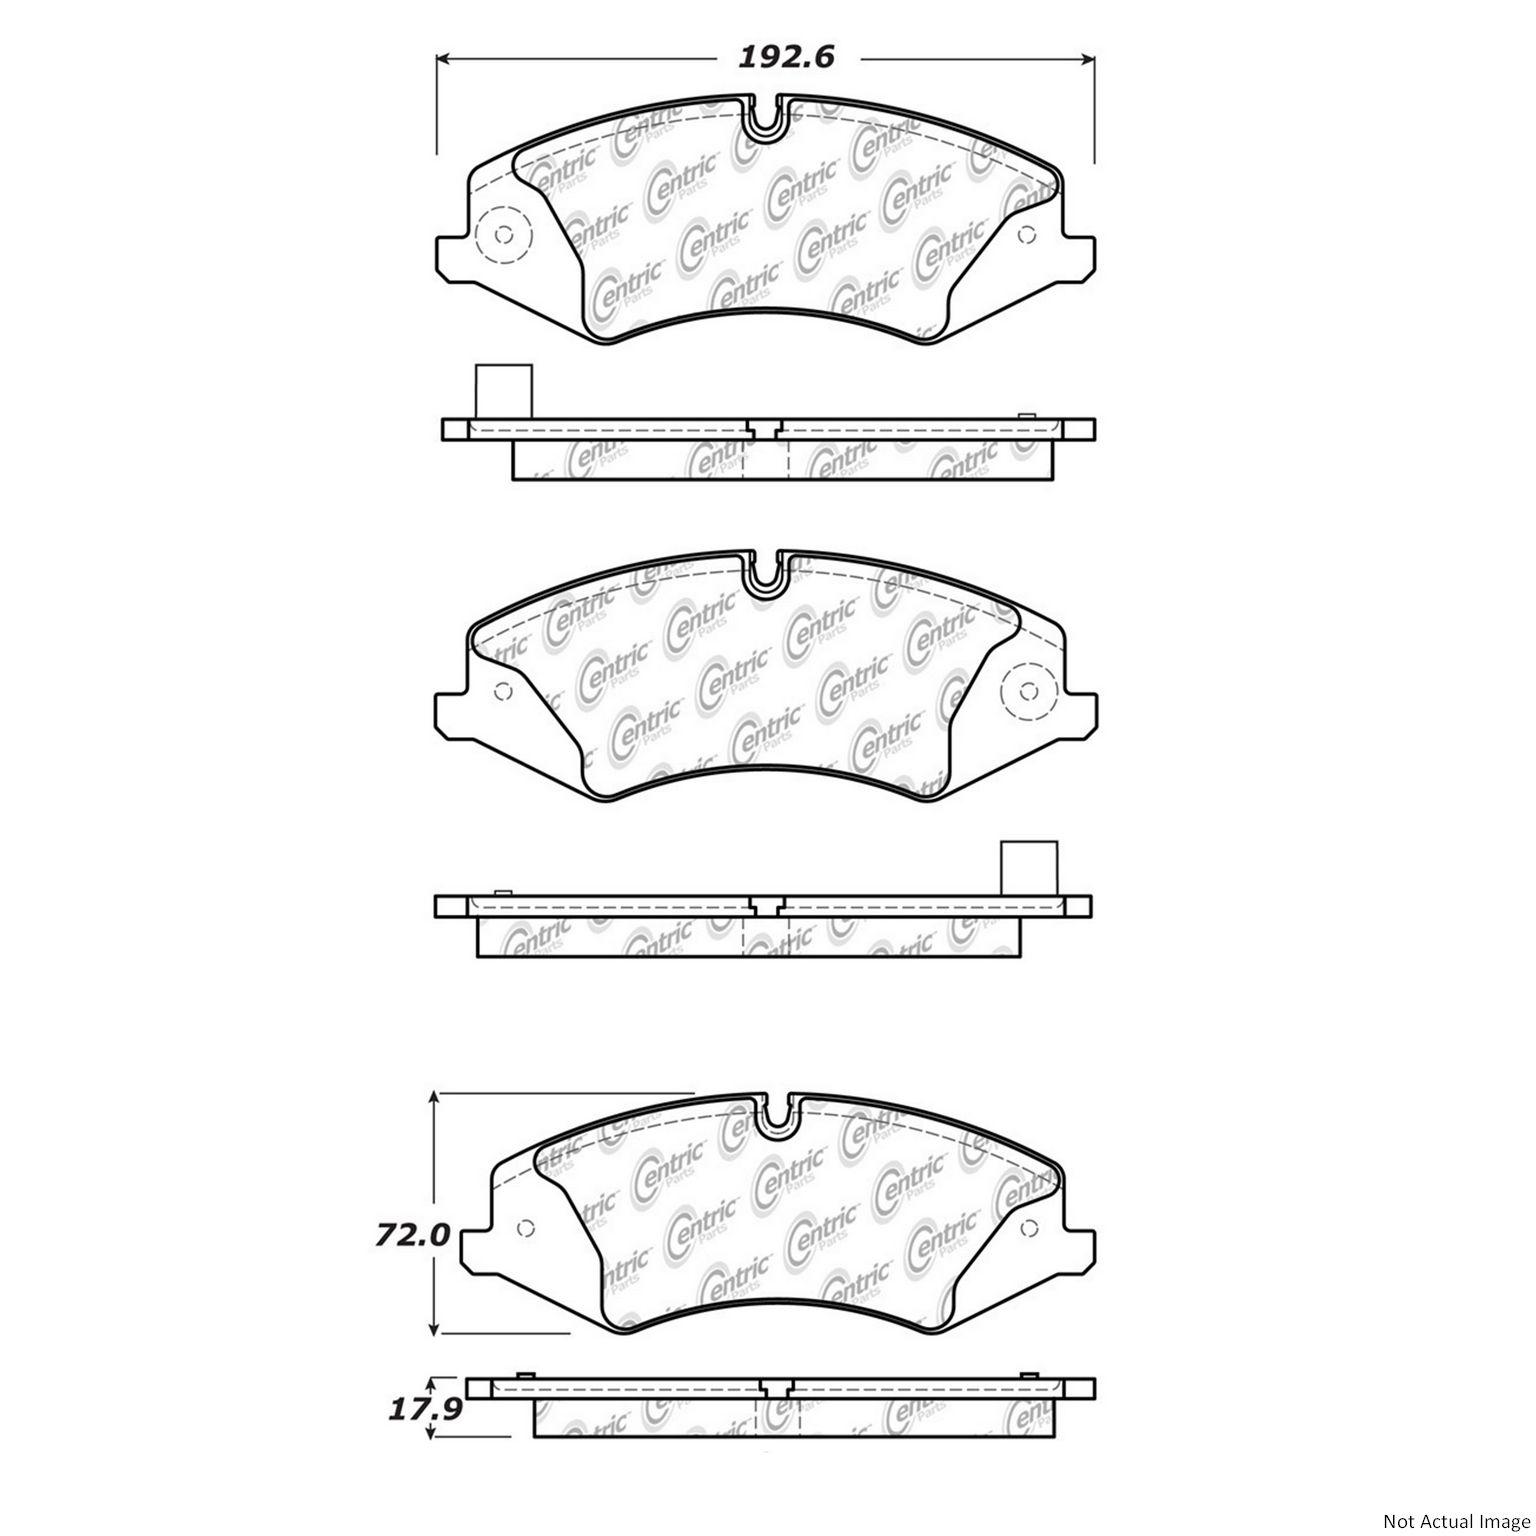 2013 Land Rover Lr4 Disc Brake Pad Set Brakes Diagram Ce 10214790